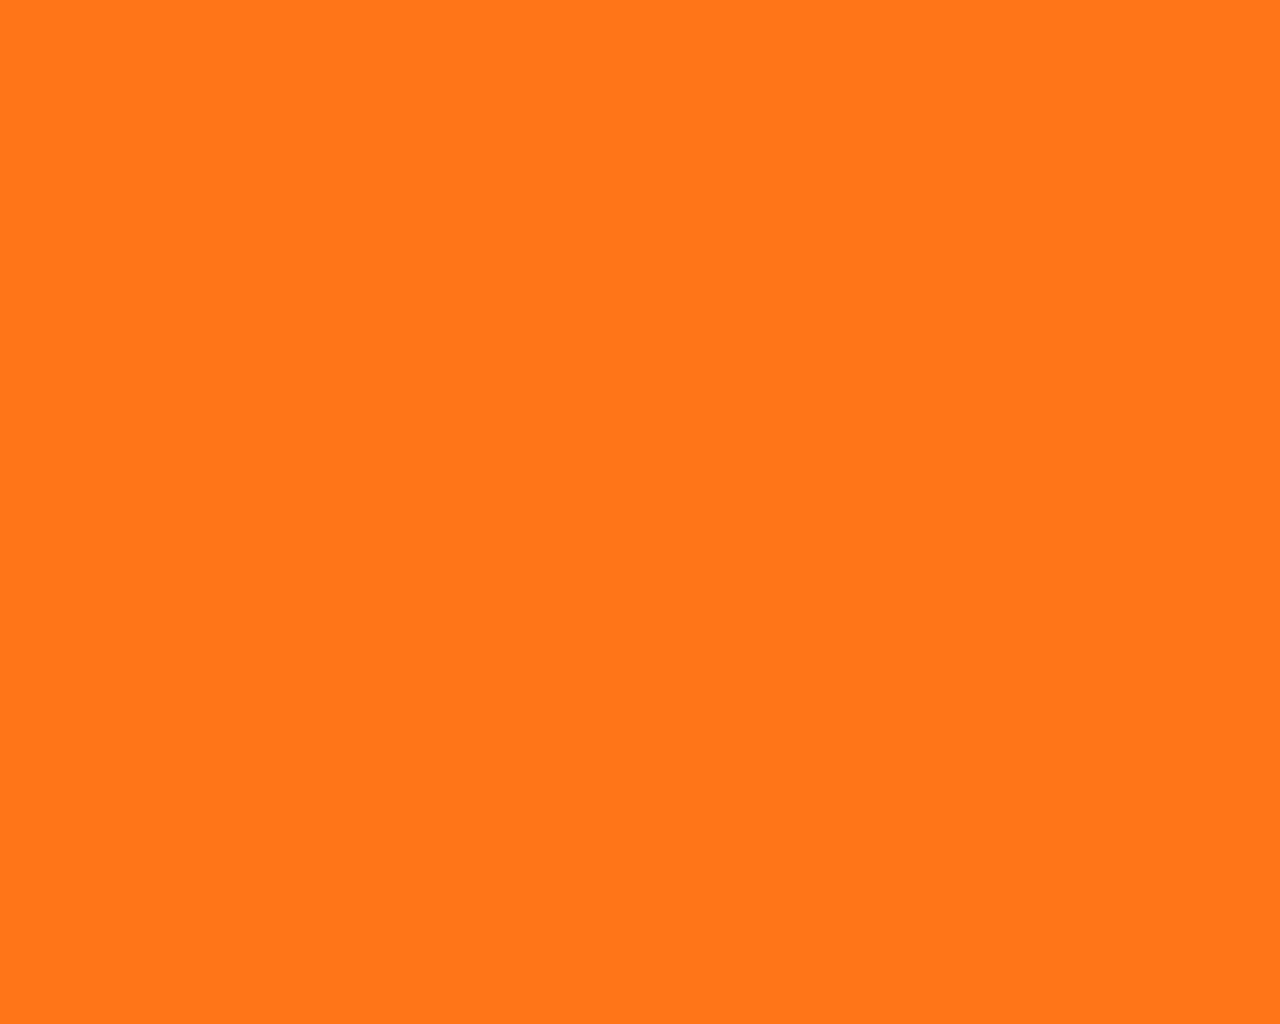 1280x1024 Pumpkin Solid Color Background